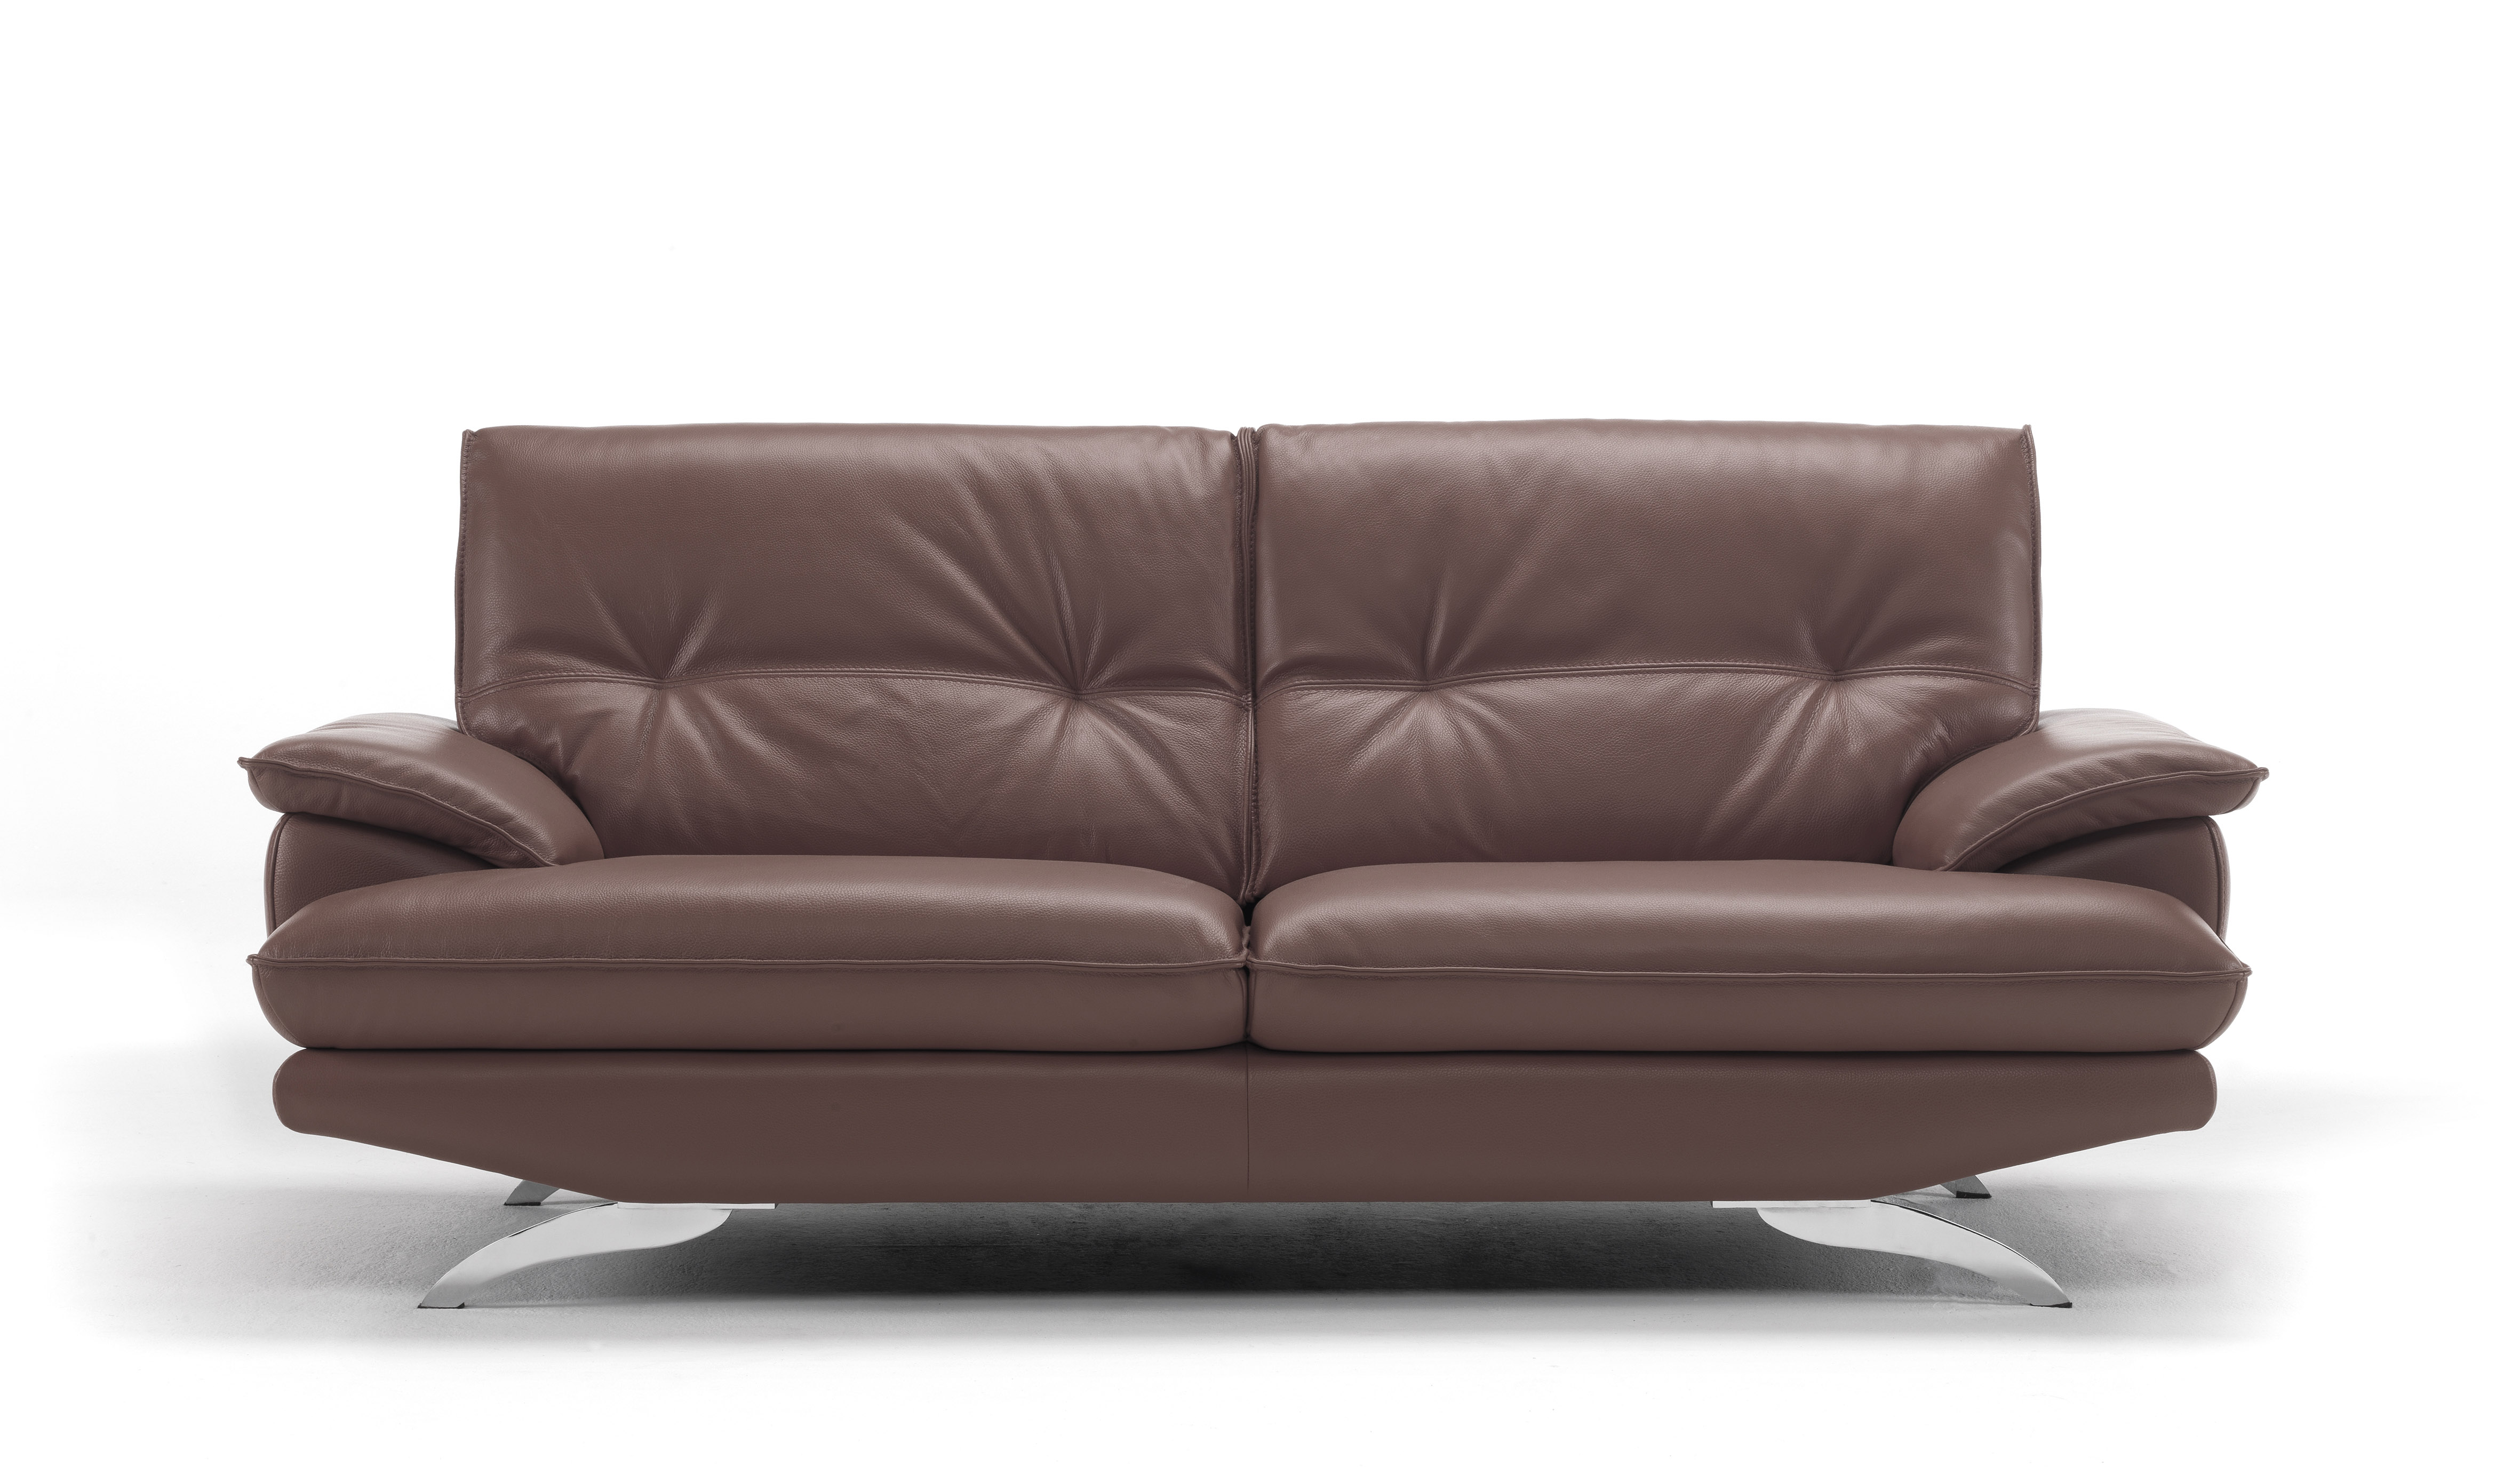 Italian Leather Living Room Set Tufted Back Cushions